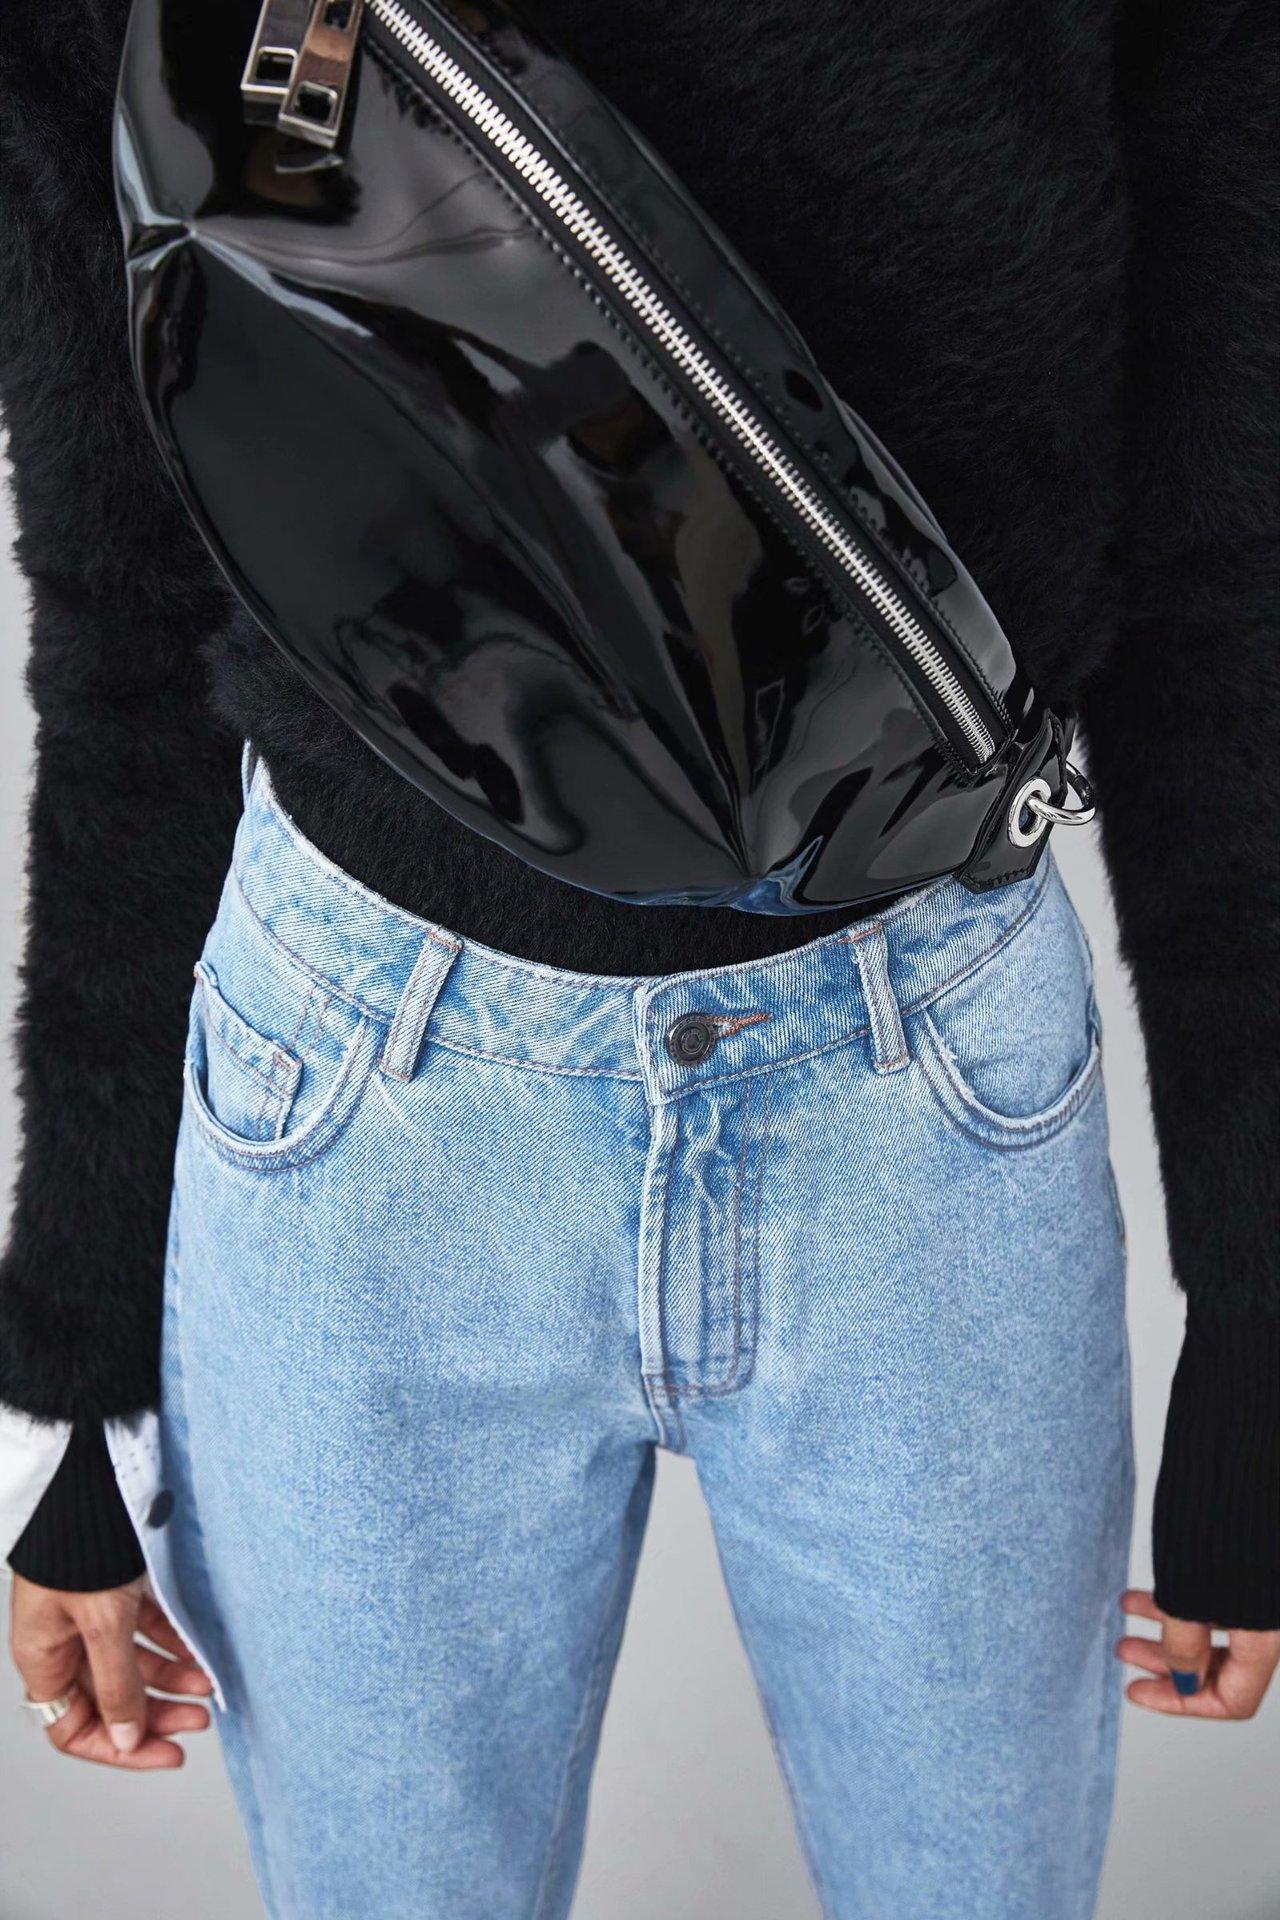 Polyester Fashion  pants  (Light blue-34)  Women Clothing NHAM7283-Light-blue-34